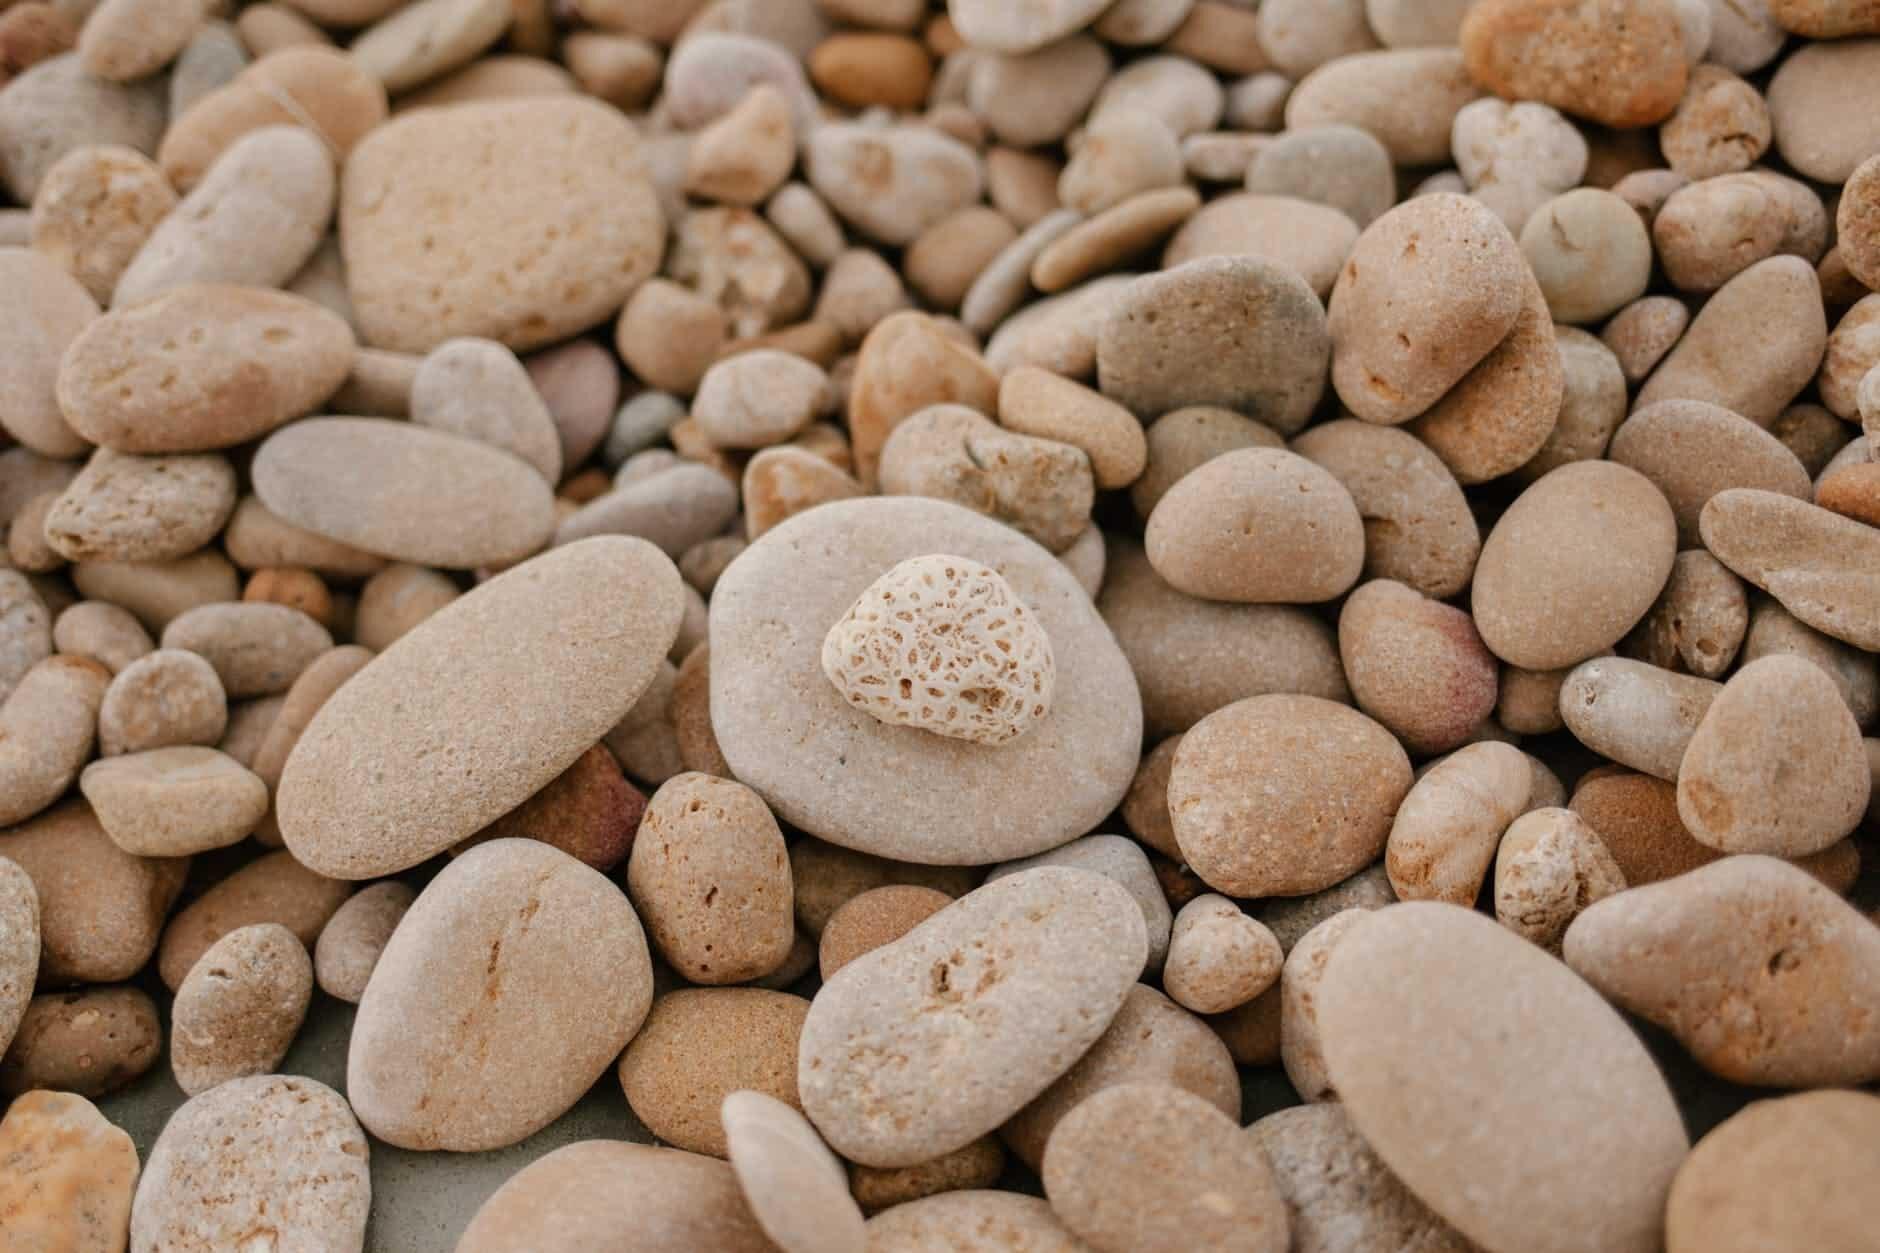 rough gray stones on beach in daylight